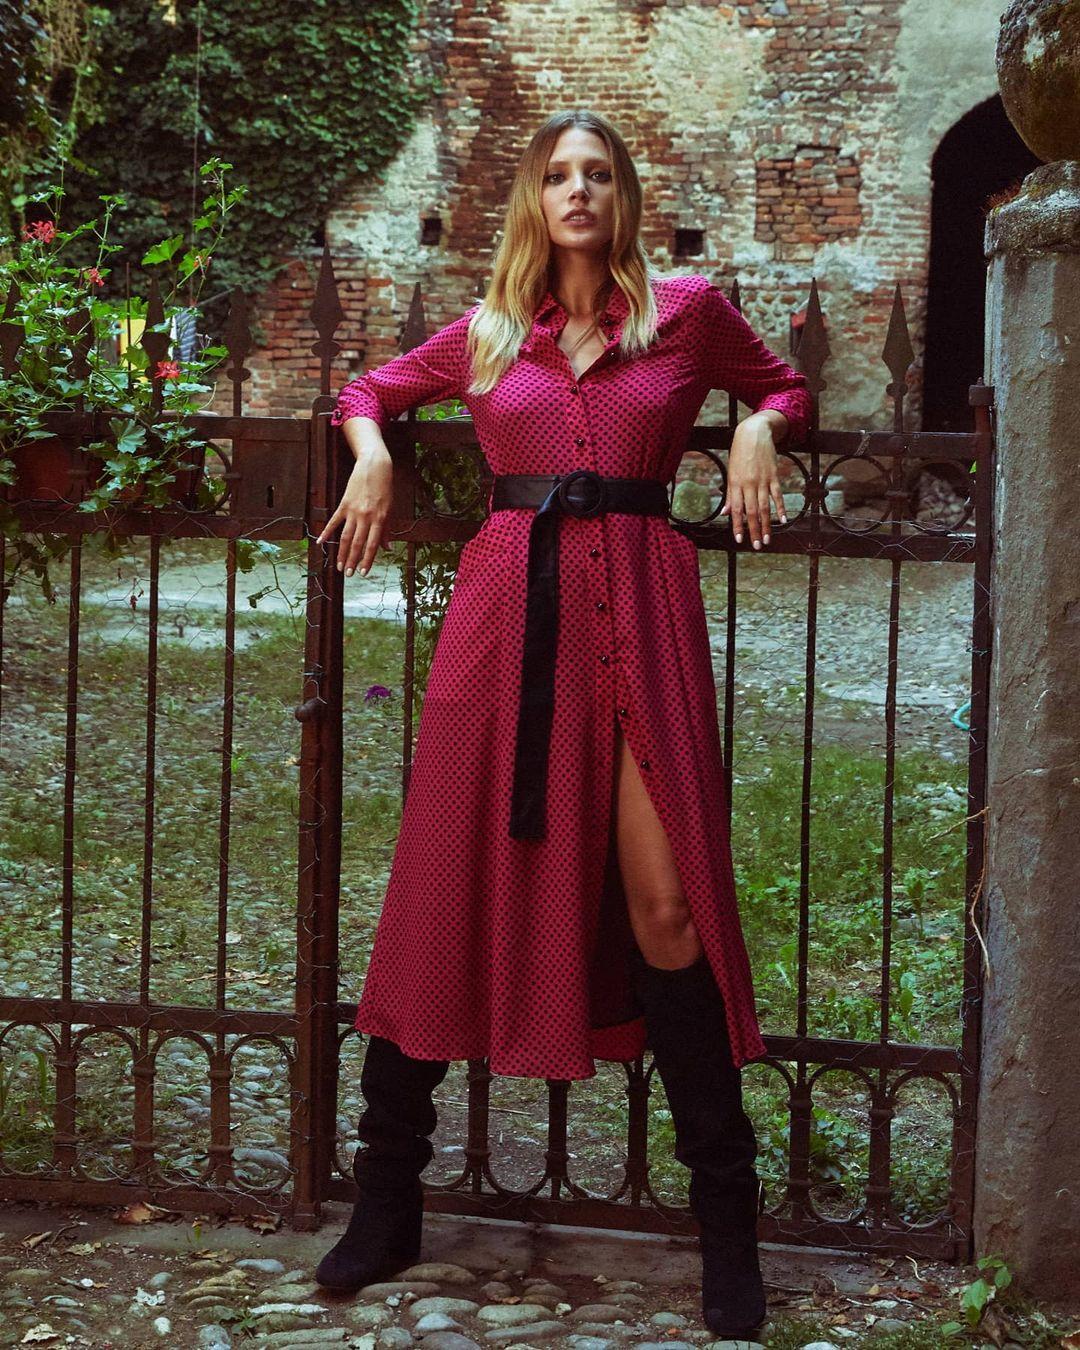 Castello di Lurano - Shooting Pinko